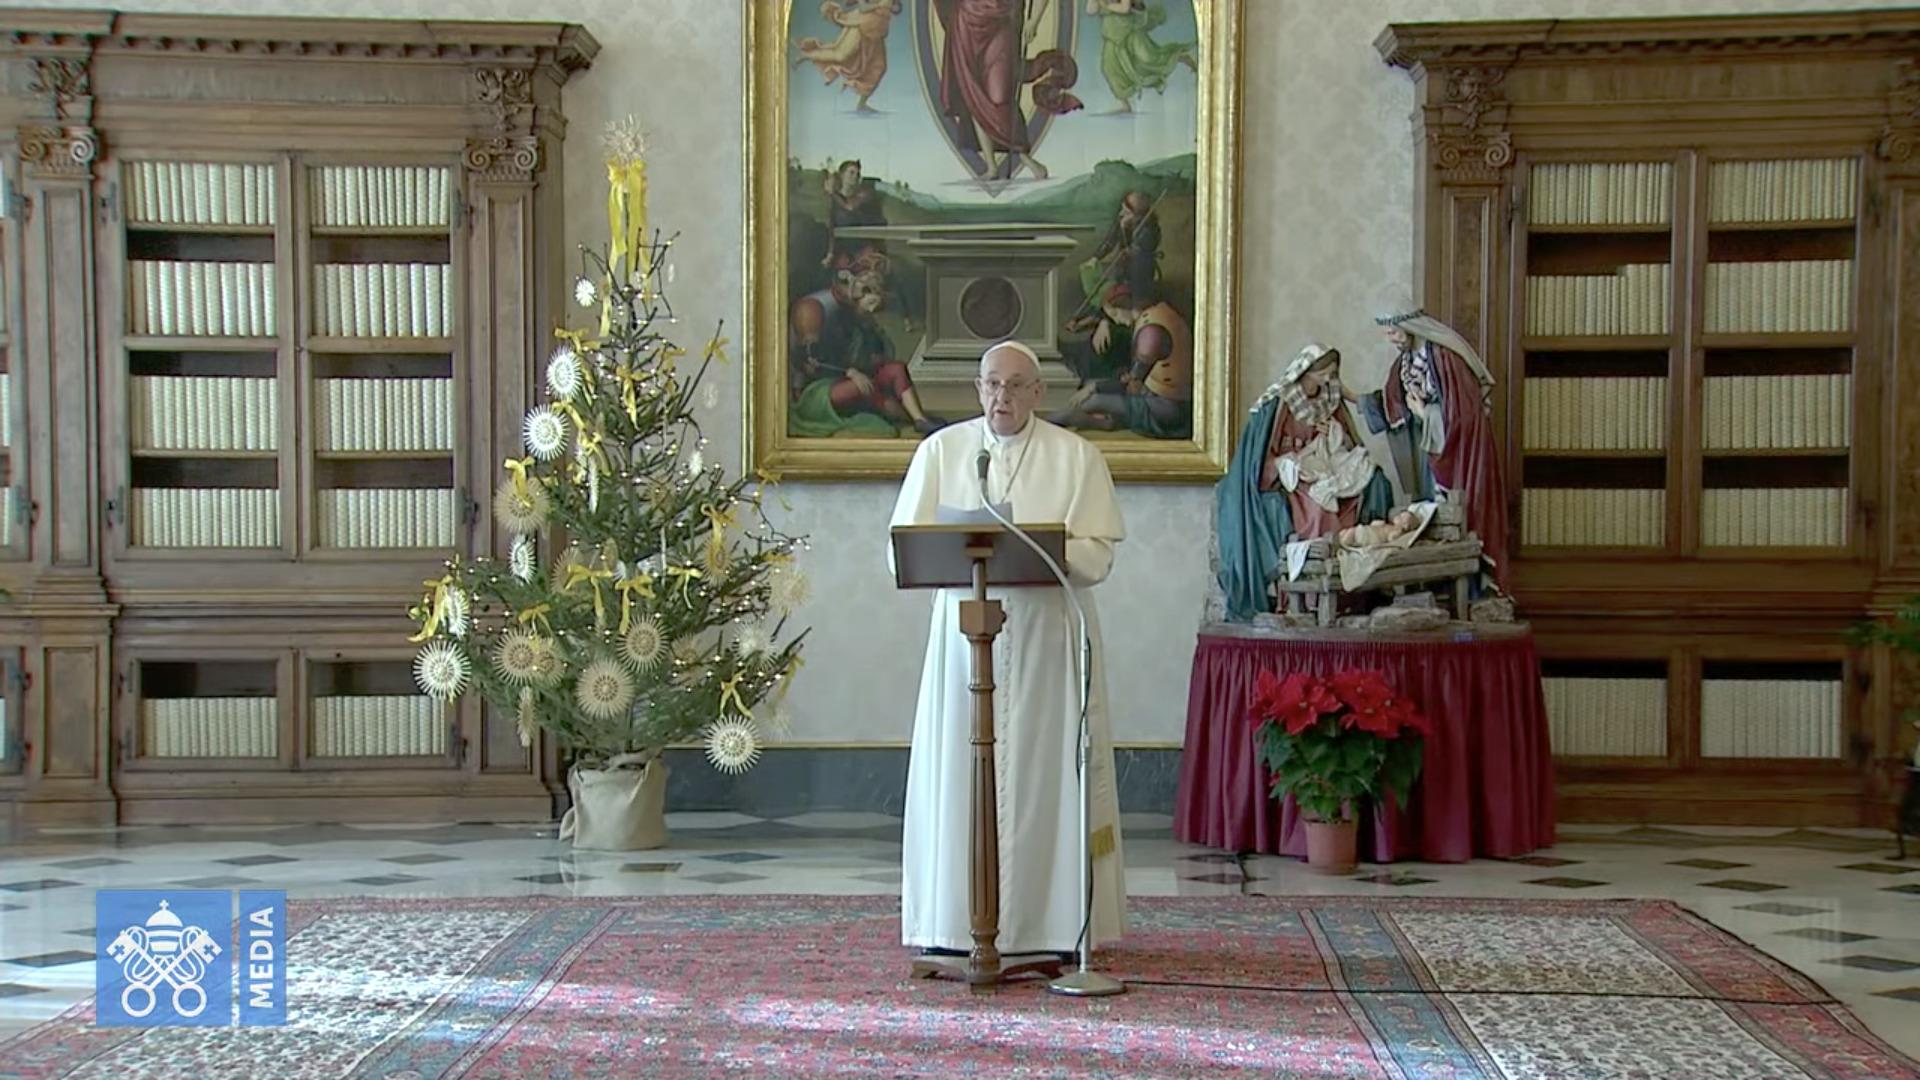 Angélus du 27 déc. 2020, capture @ Vatican Media